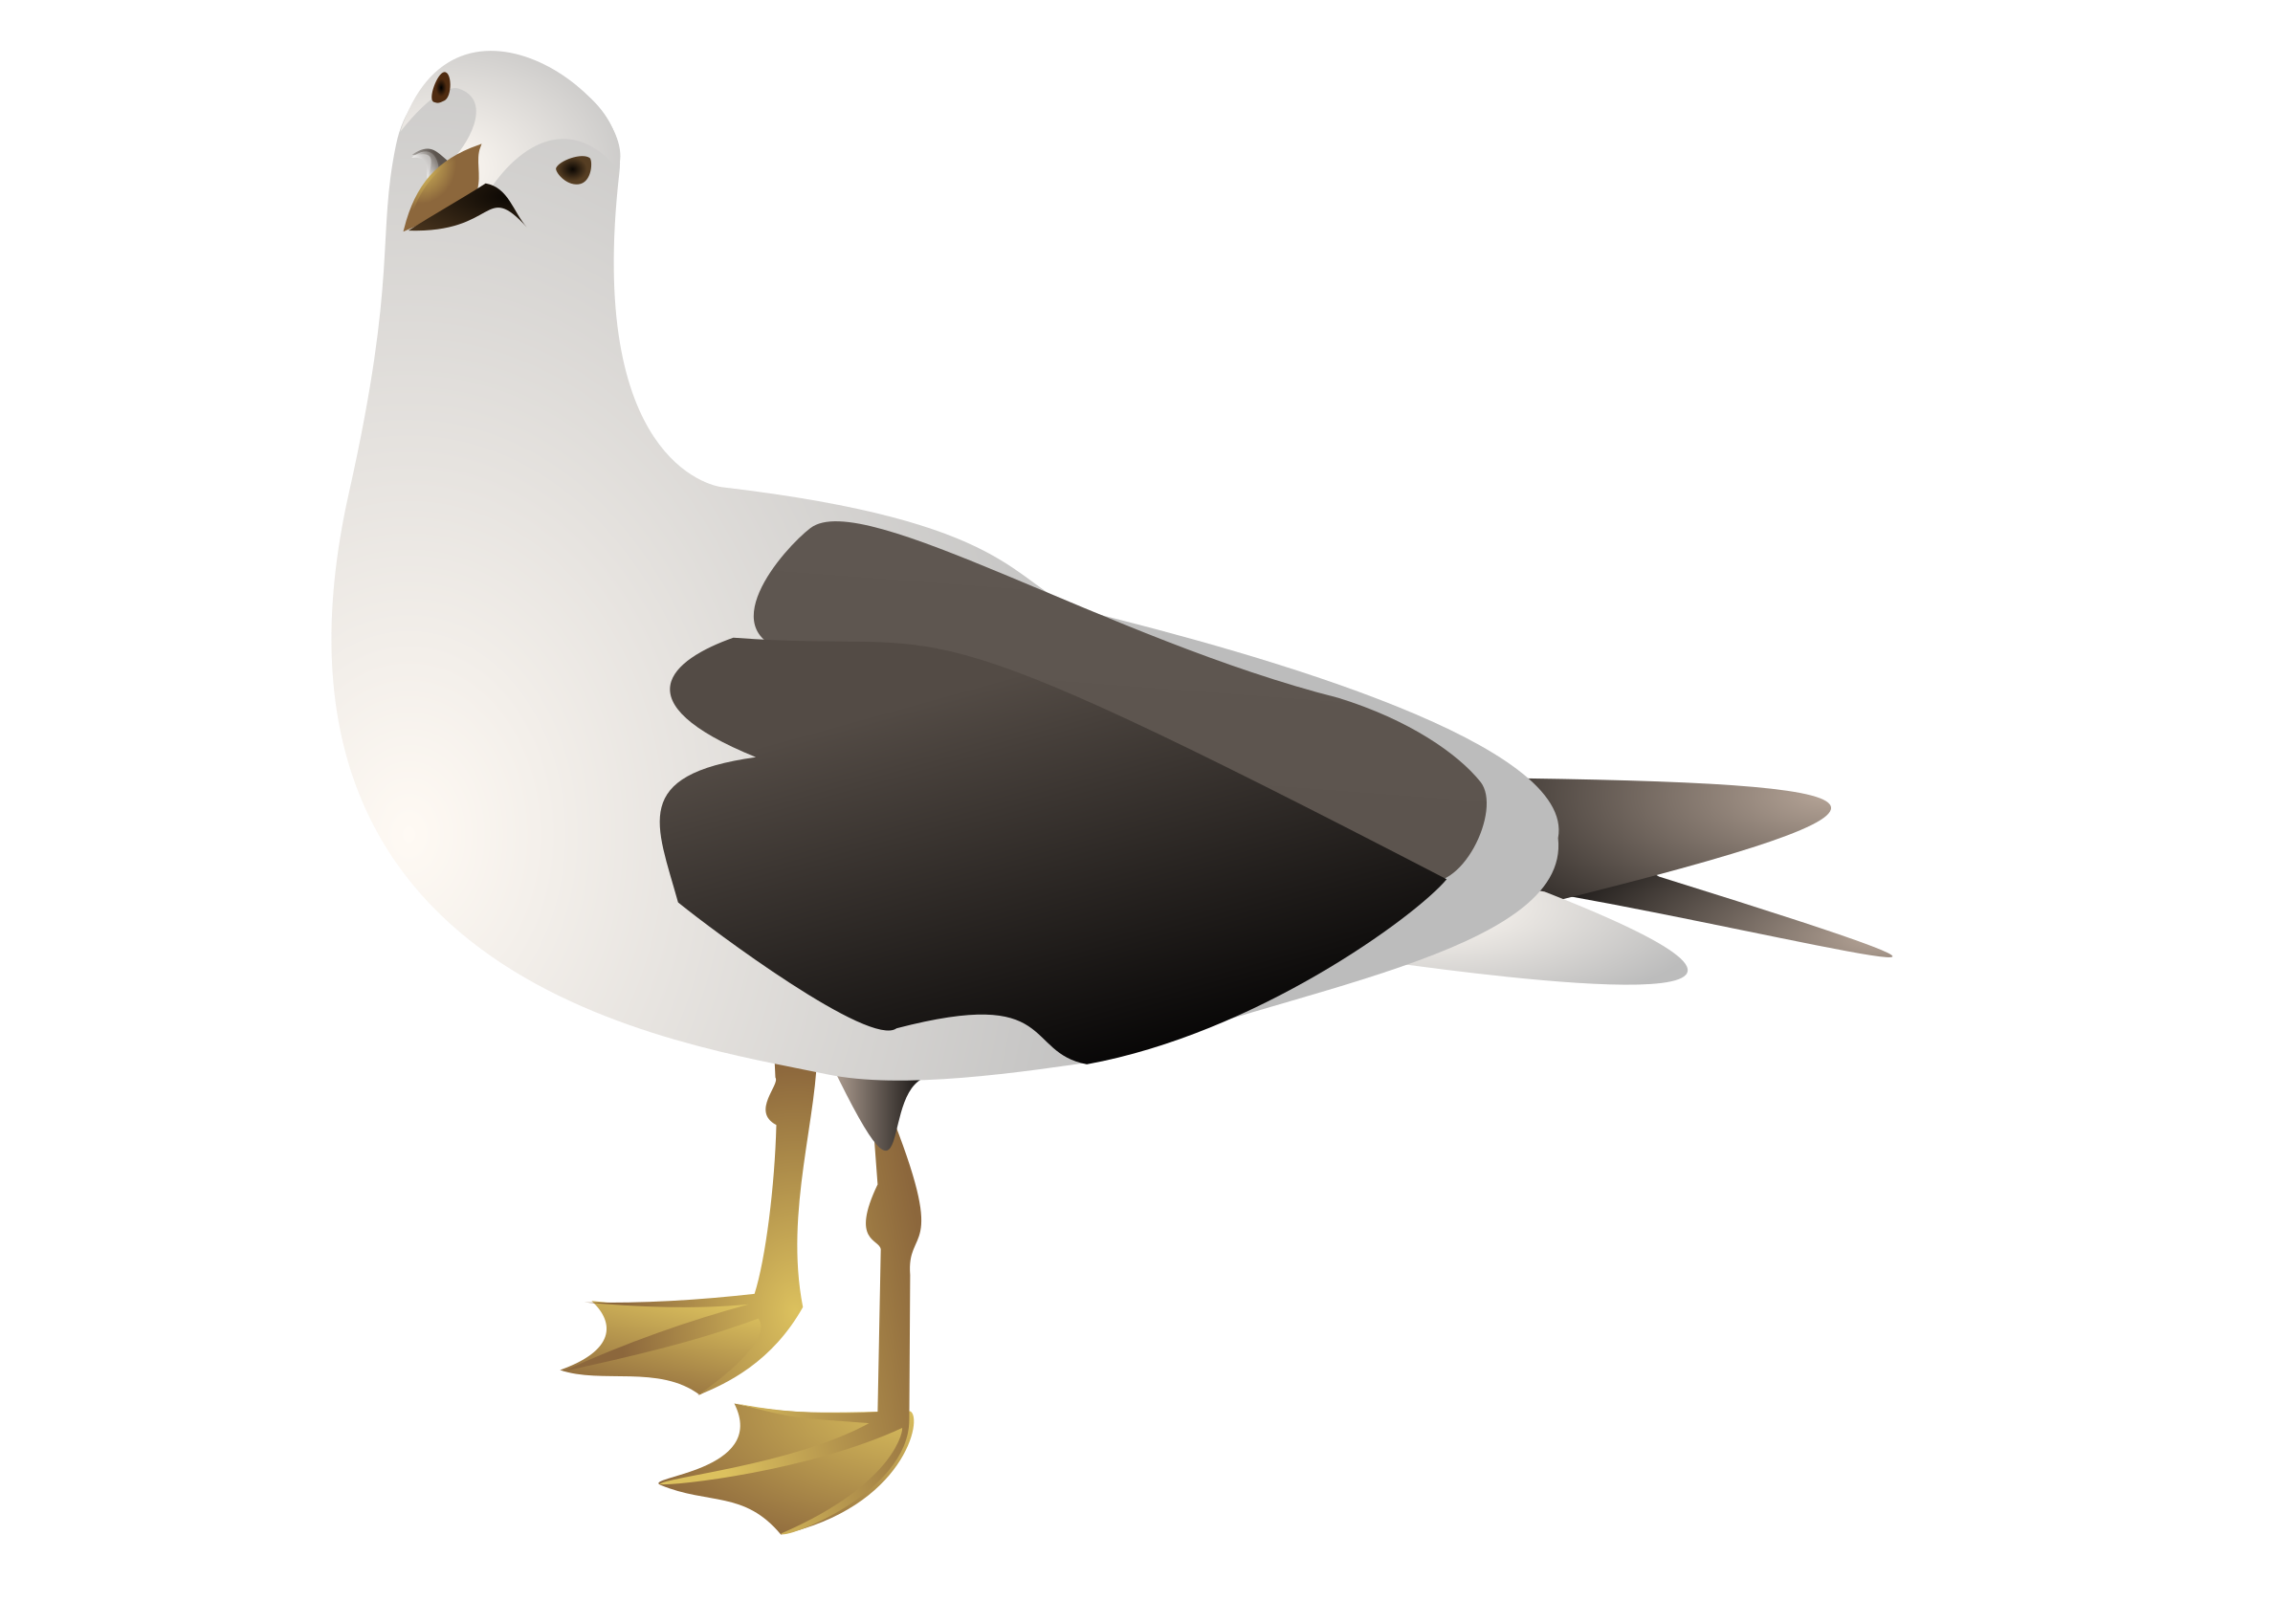 Clipart seagull